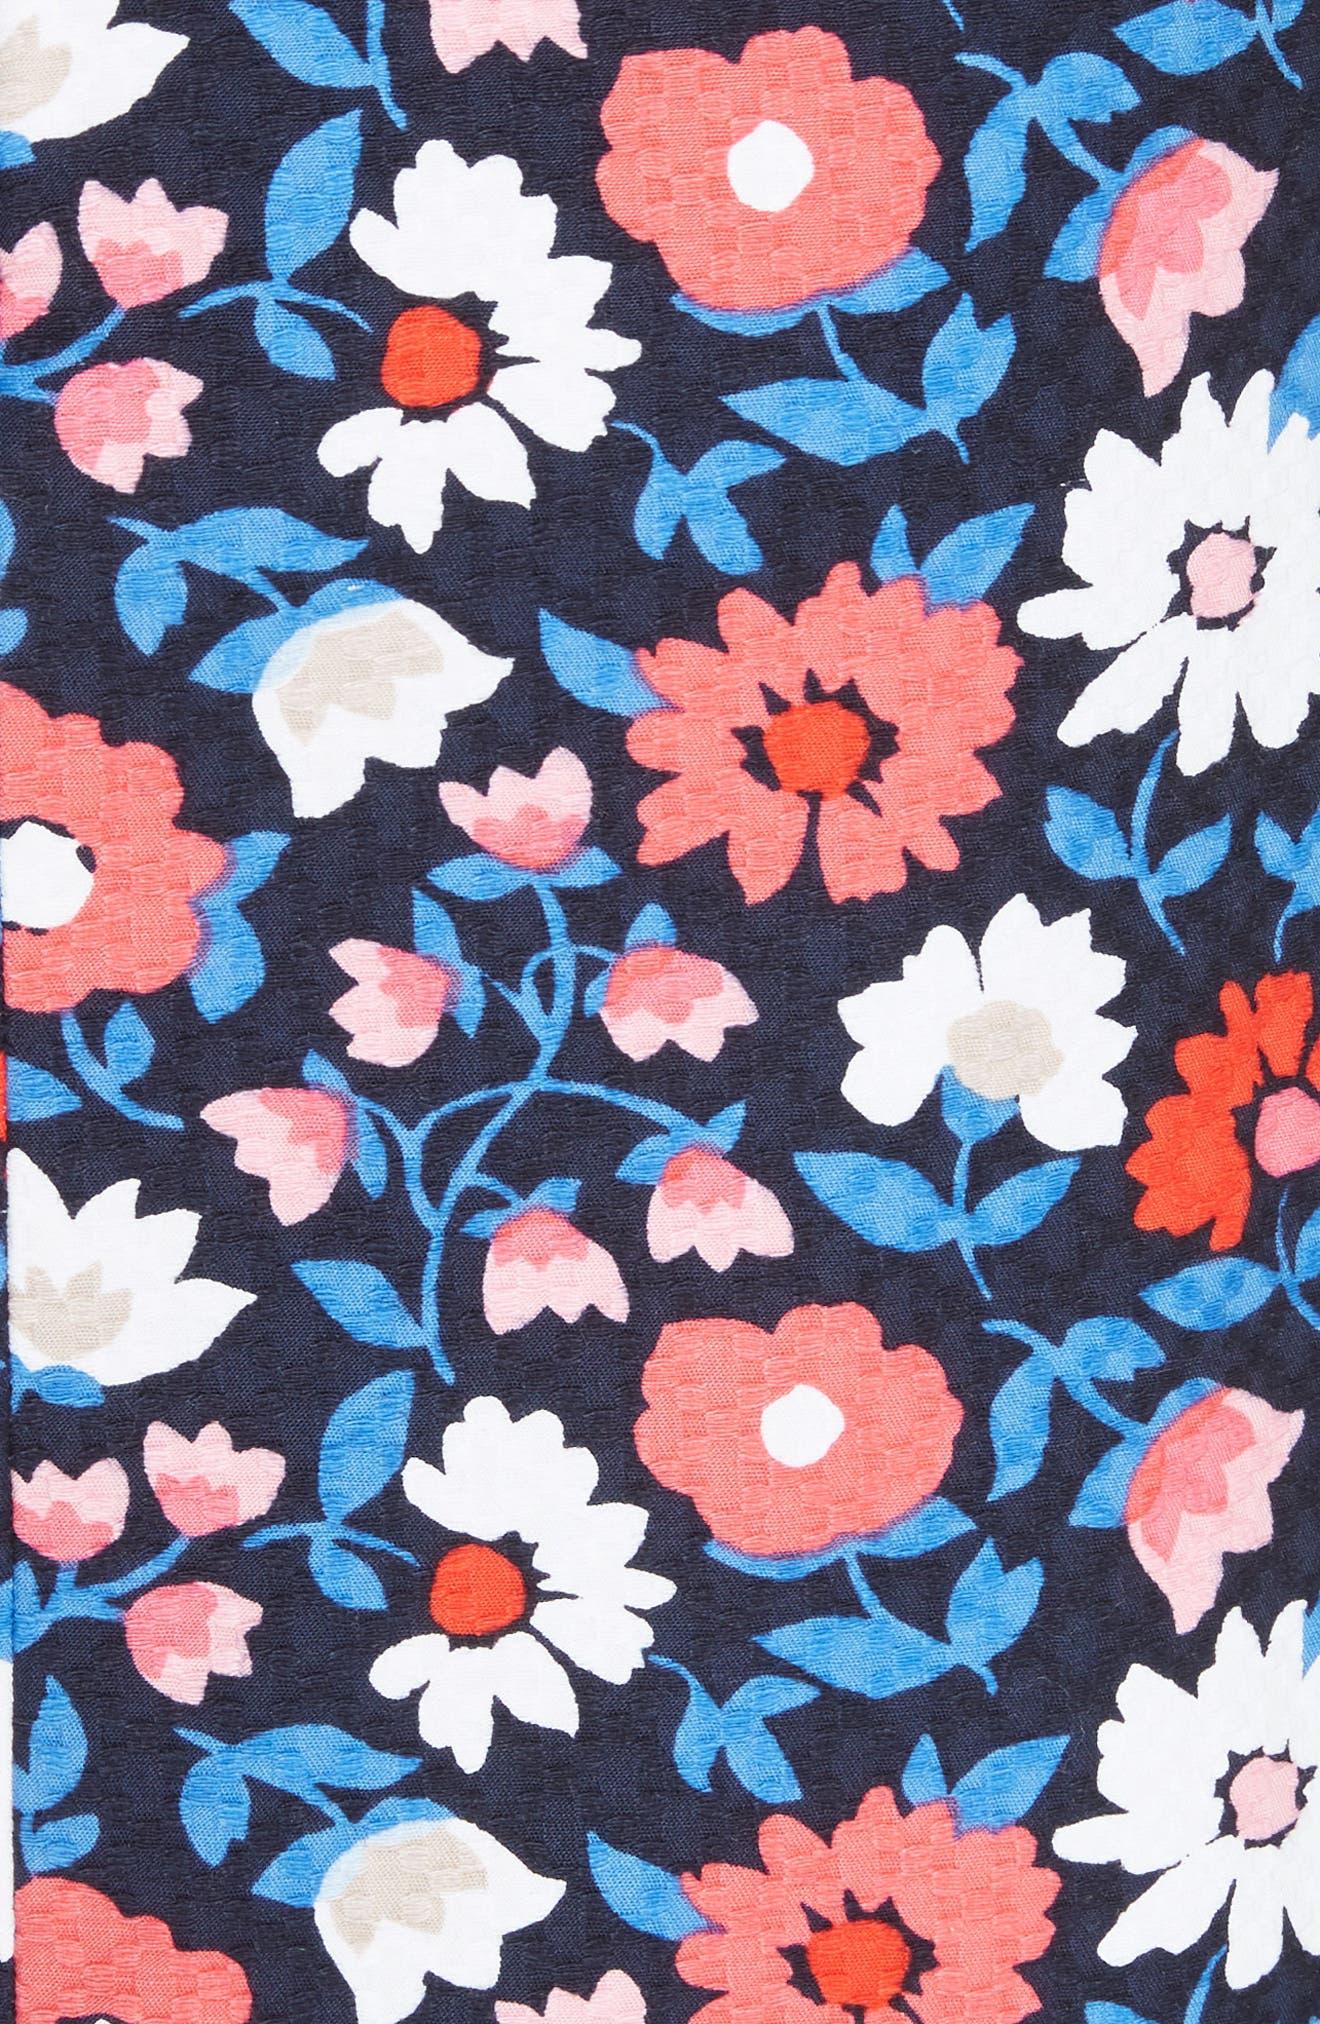 daisy jacquard A-line skirt,                             Alternate thumbnail 5, color,                             Rich Navy